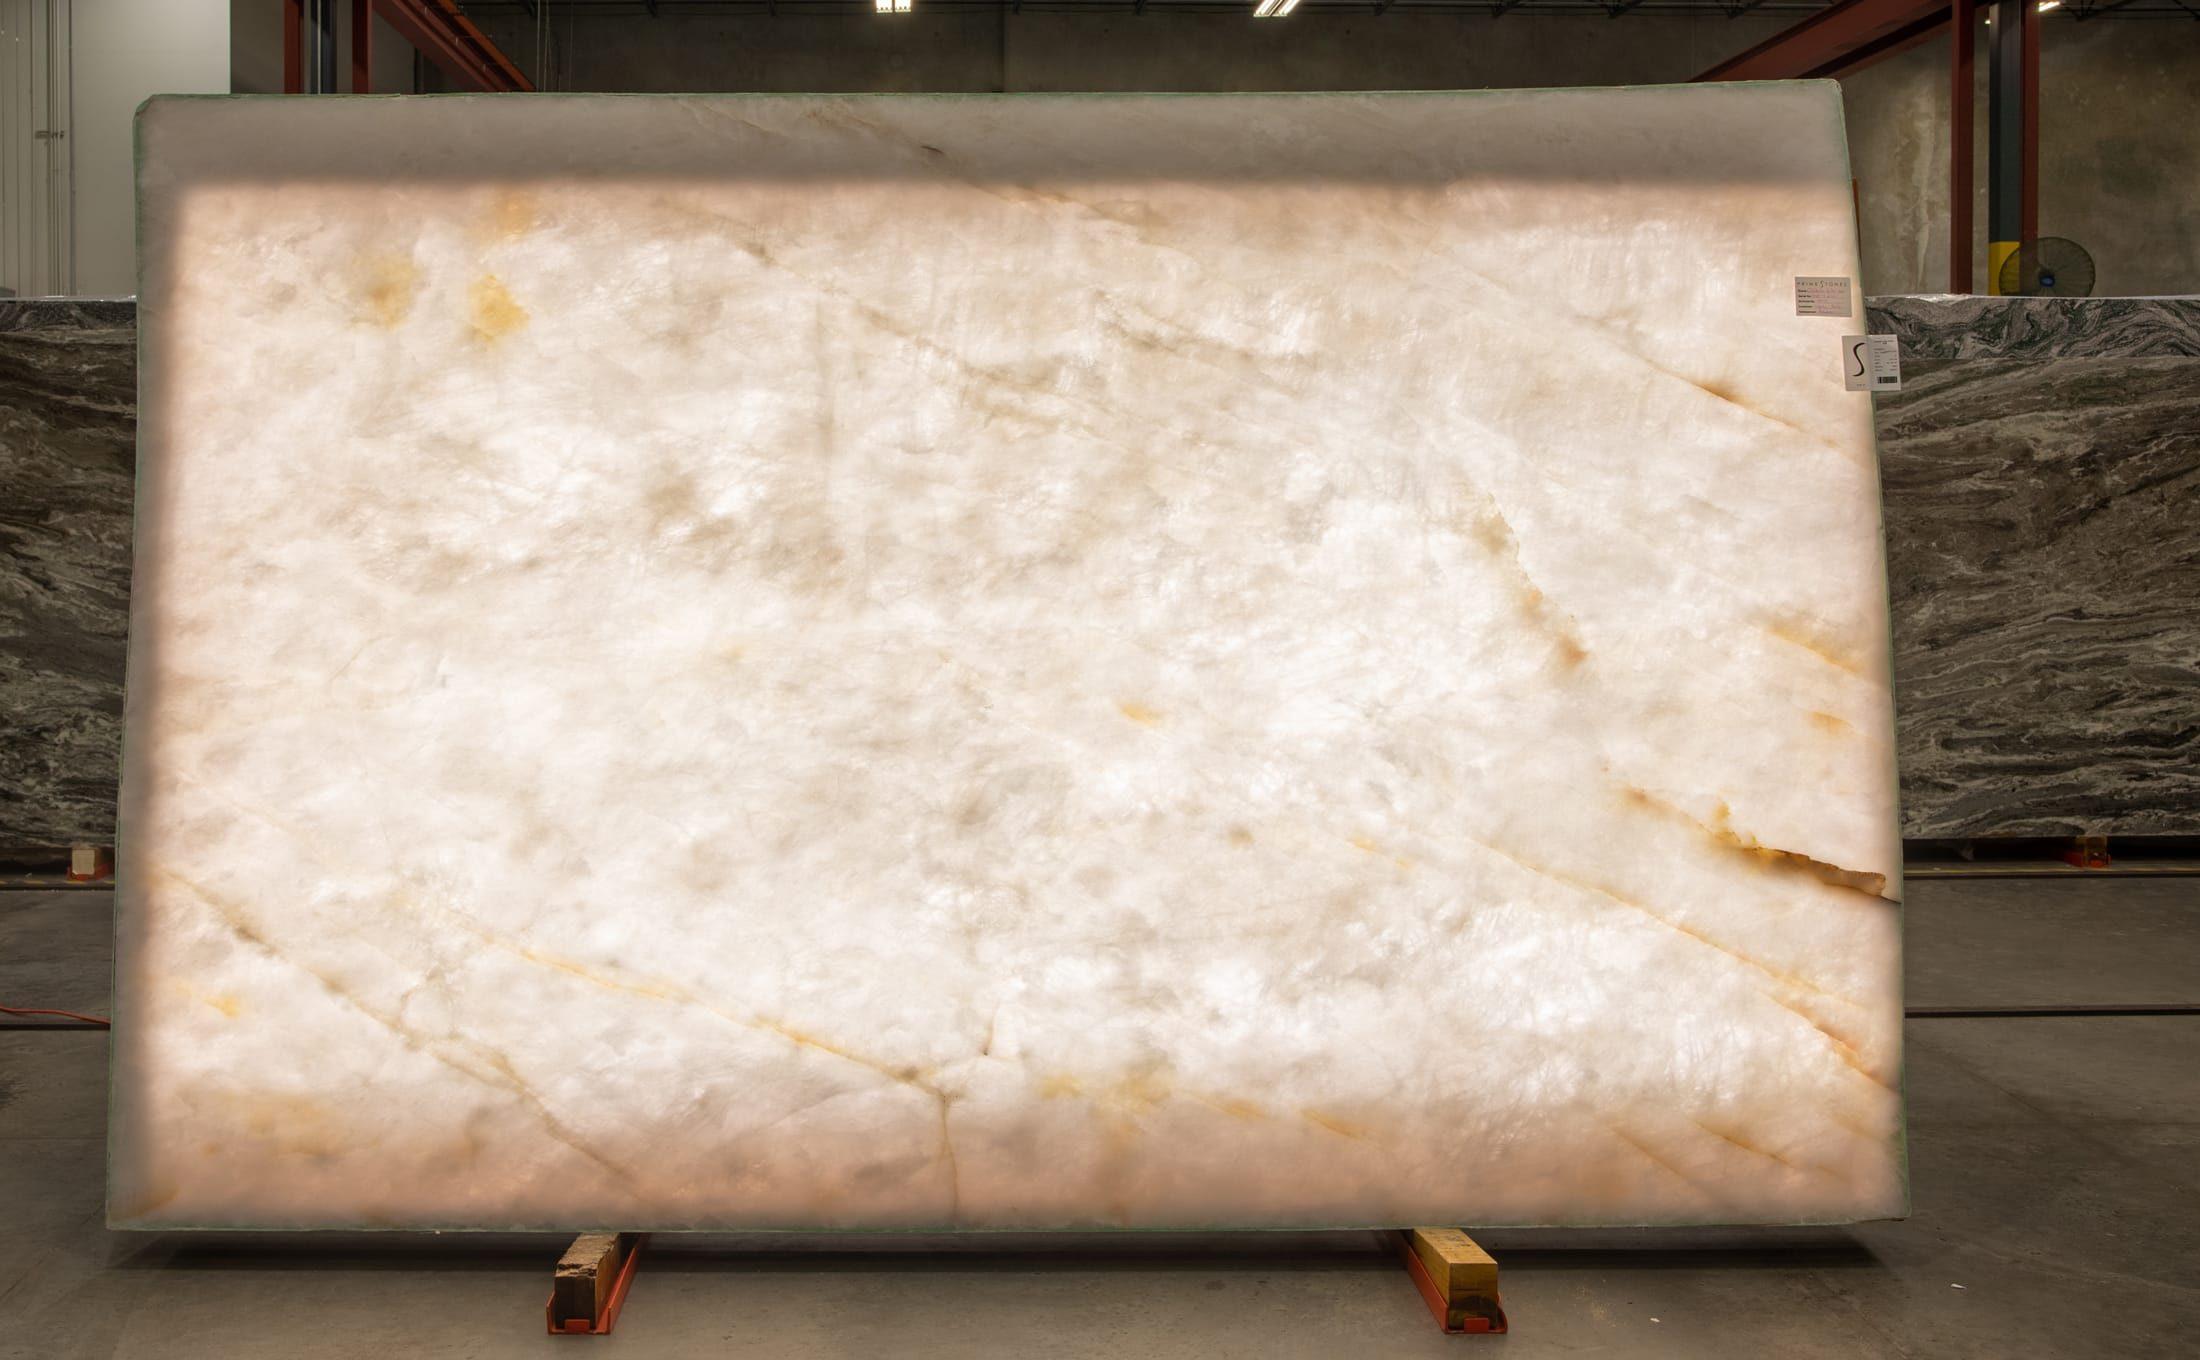 Cristallo Extra Backlit Full C Final P6tw0yiu5ejb01ae56vy89byxq543uc9aehecvh6ow, Primestones® Granite, Quartz, Marble